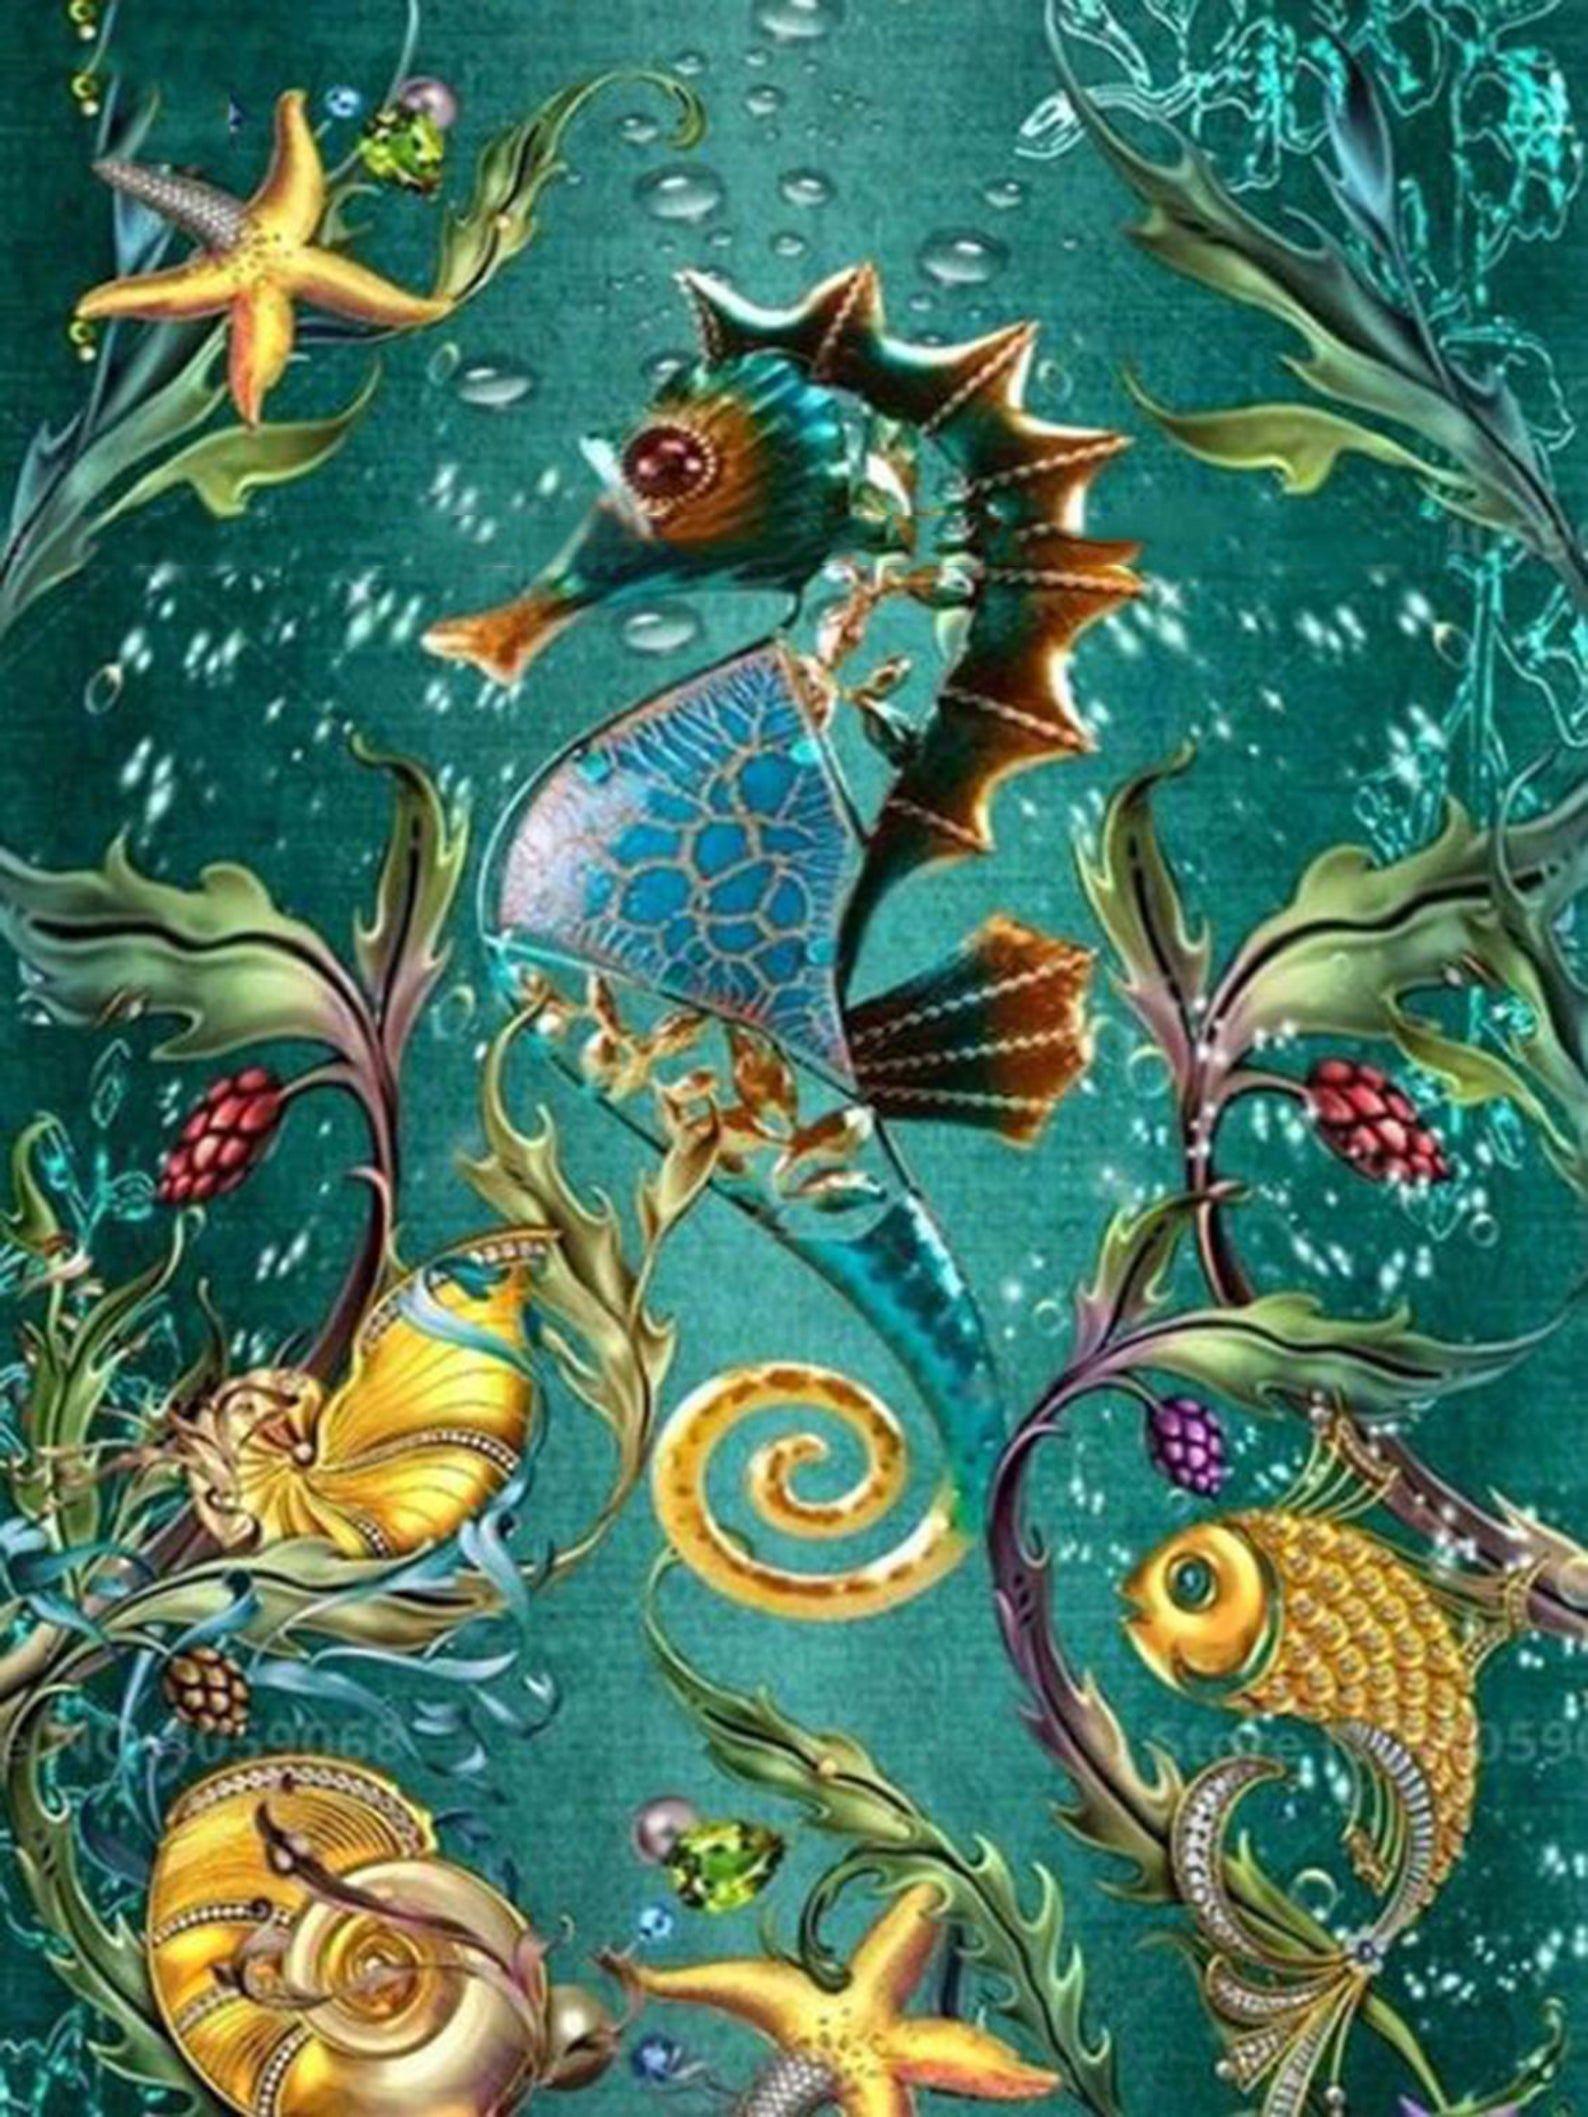 5D Diamond Painting Embroidery Cross Stitch Fish Arts Craft Kit Mural Decor